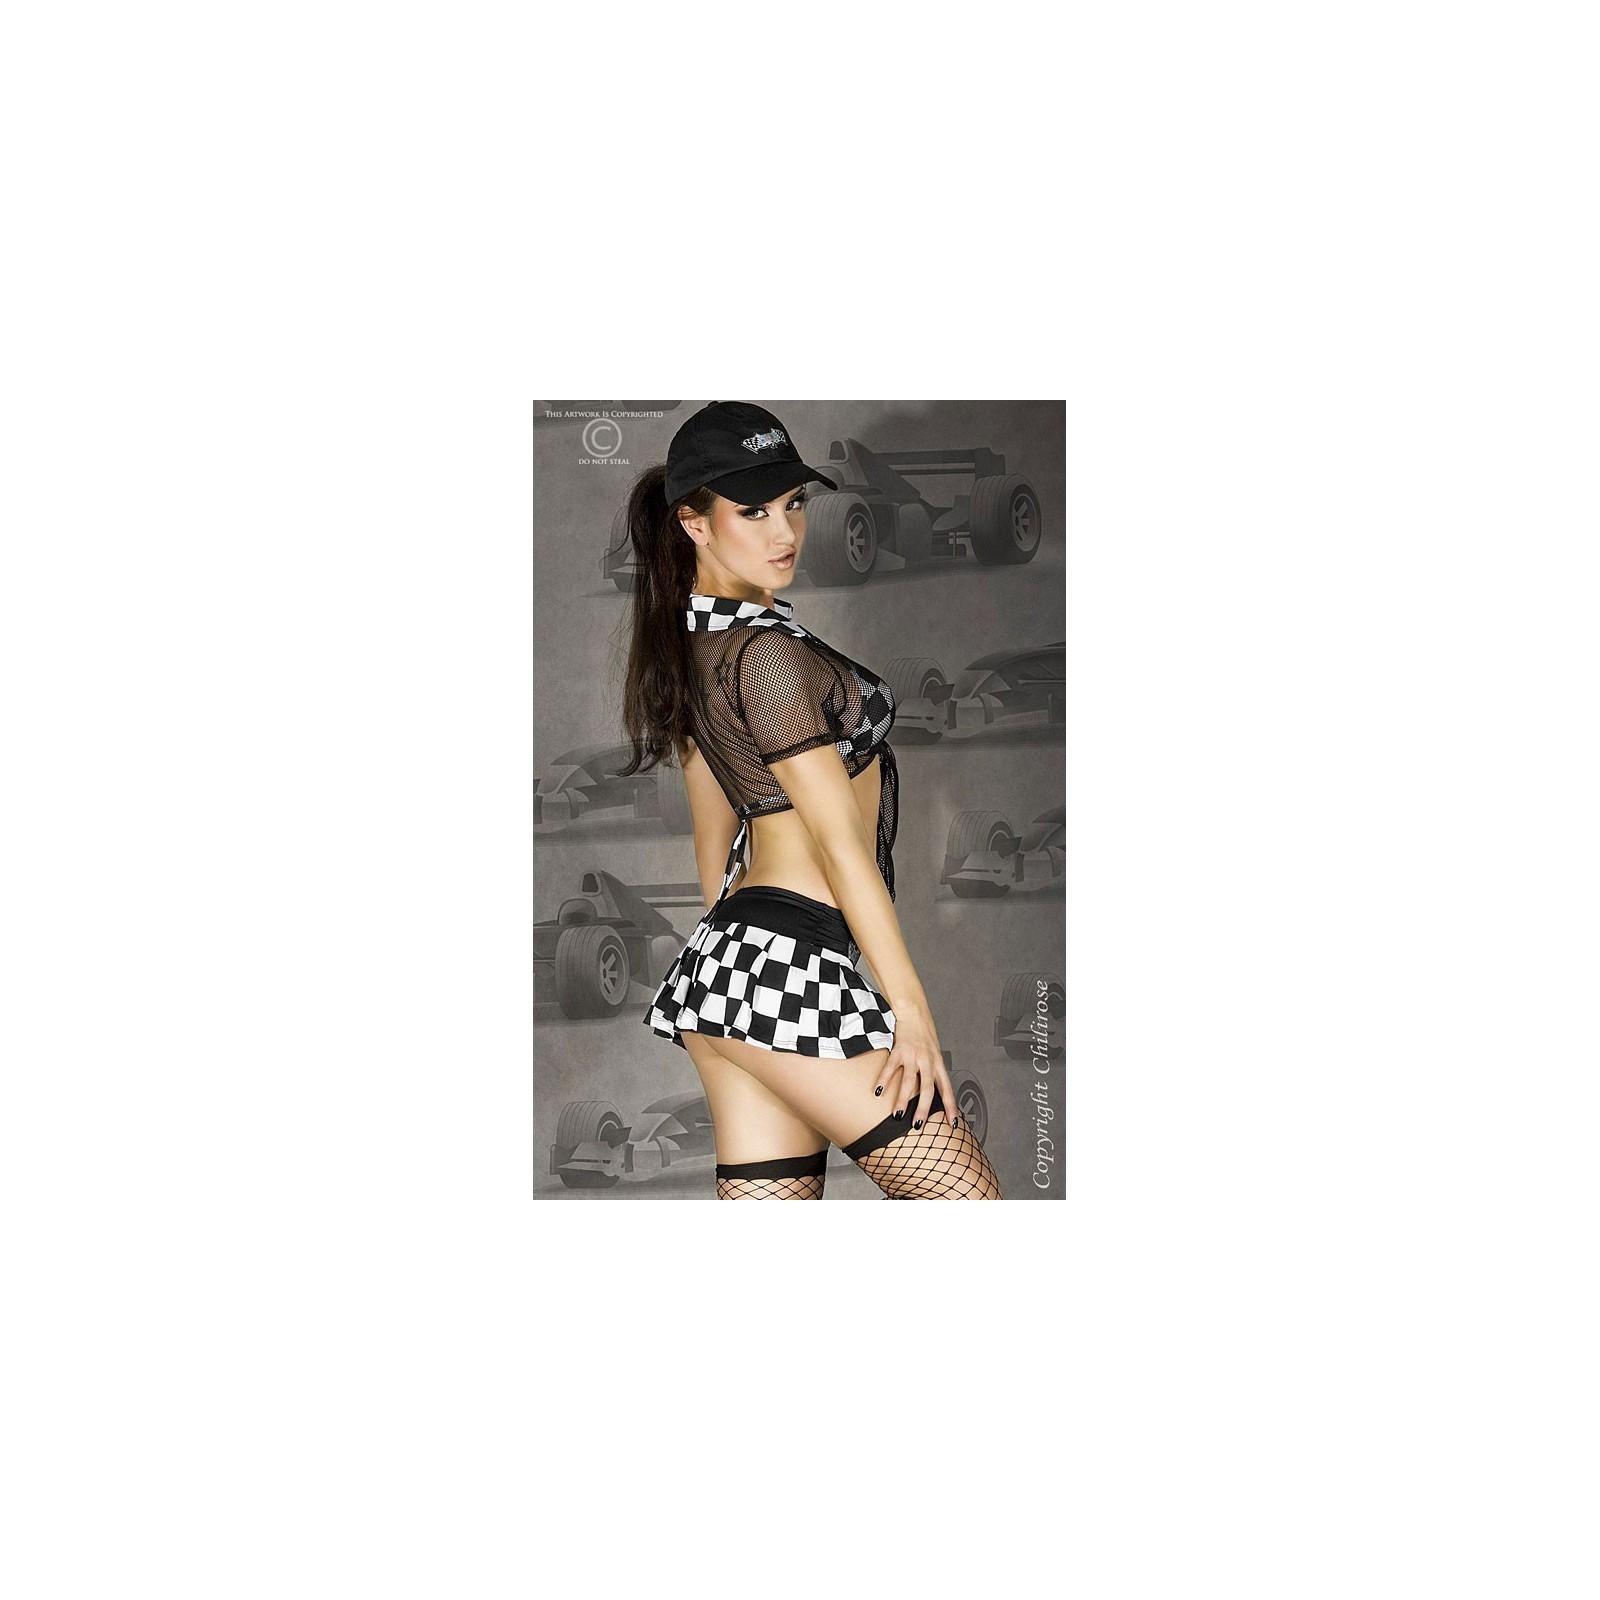 Racing Girl CR3326 - 2 - Vorschaubild